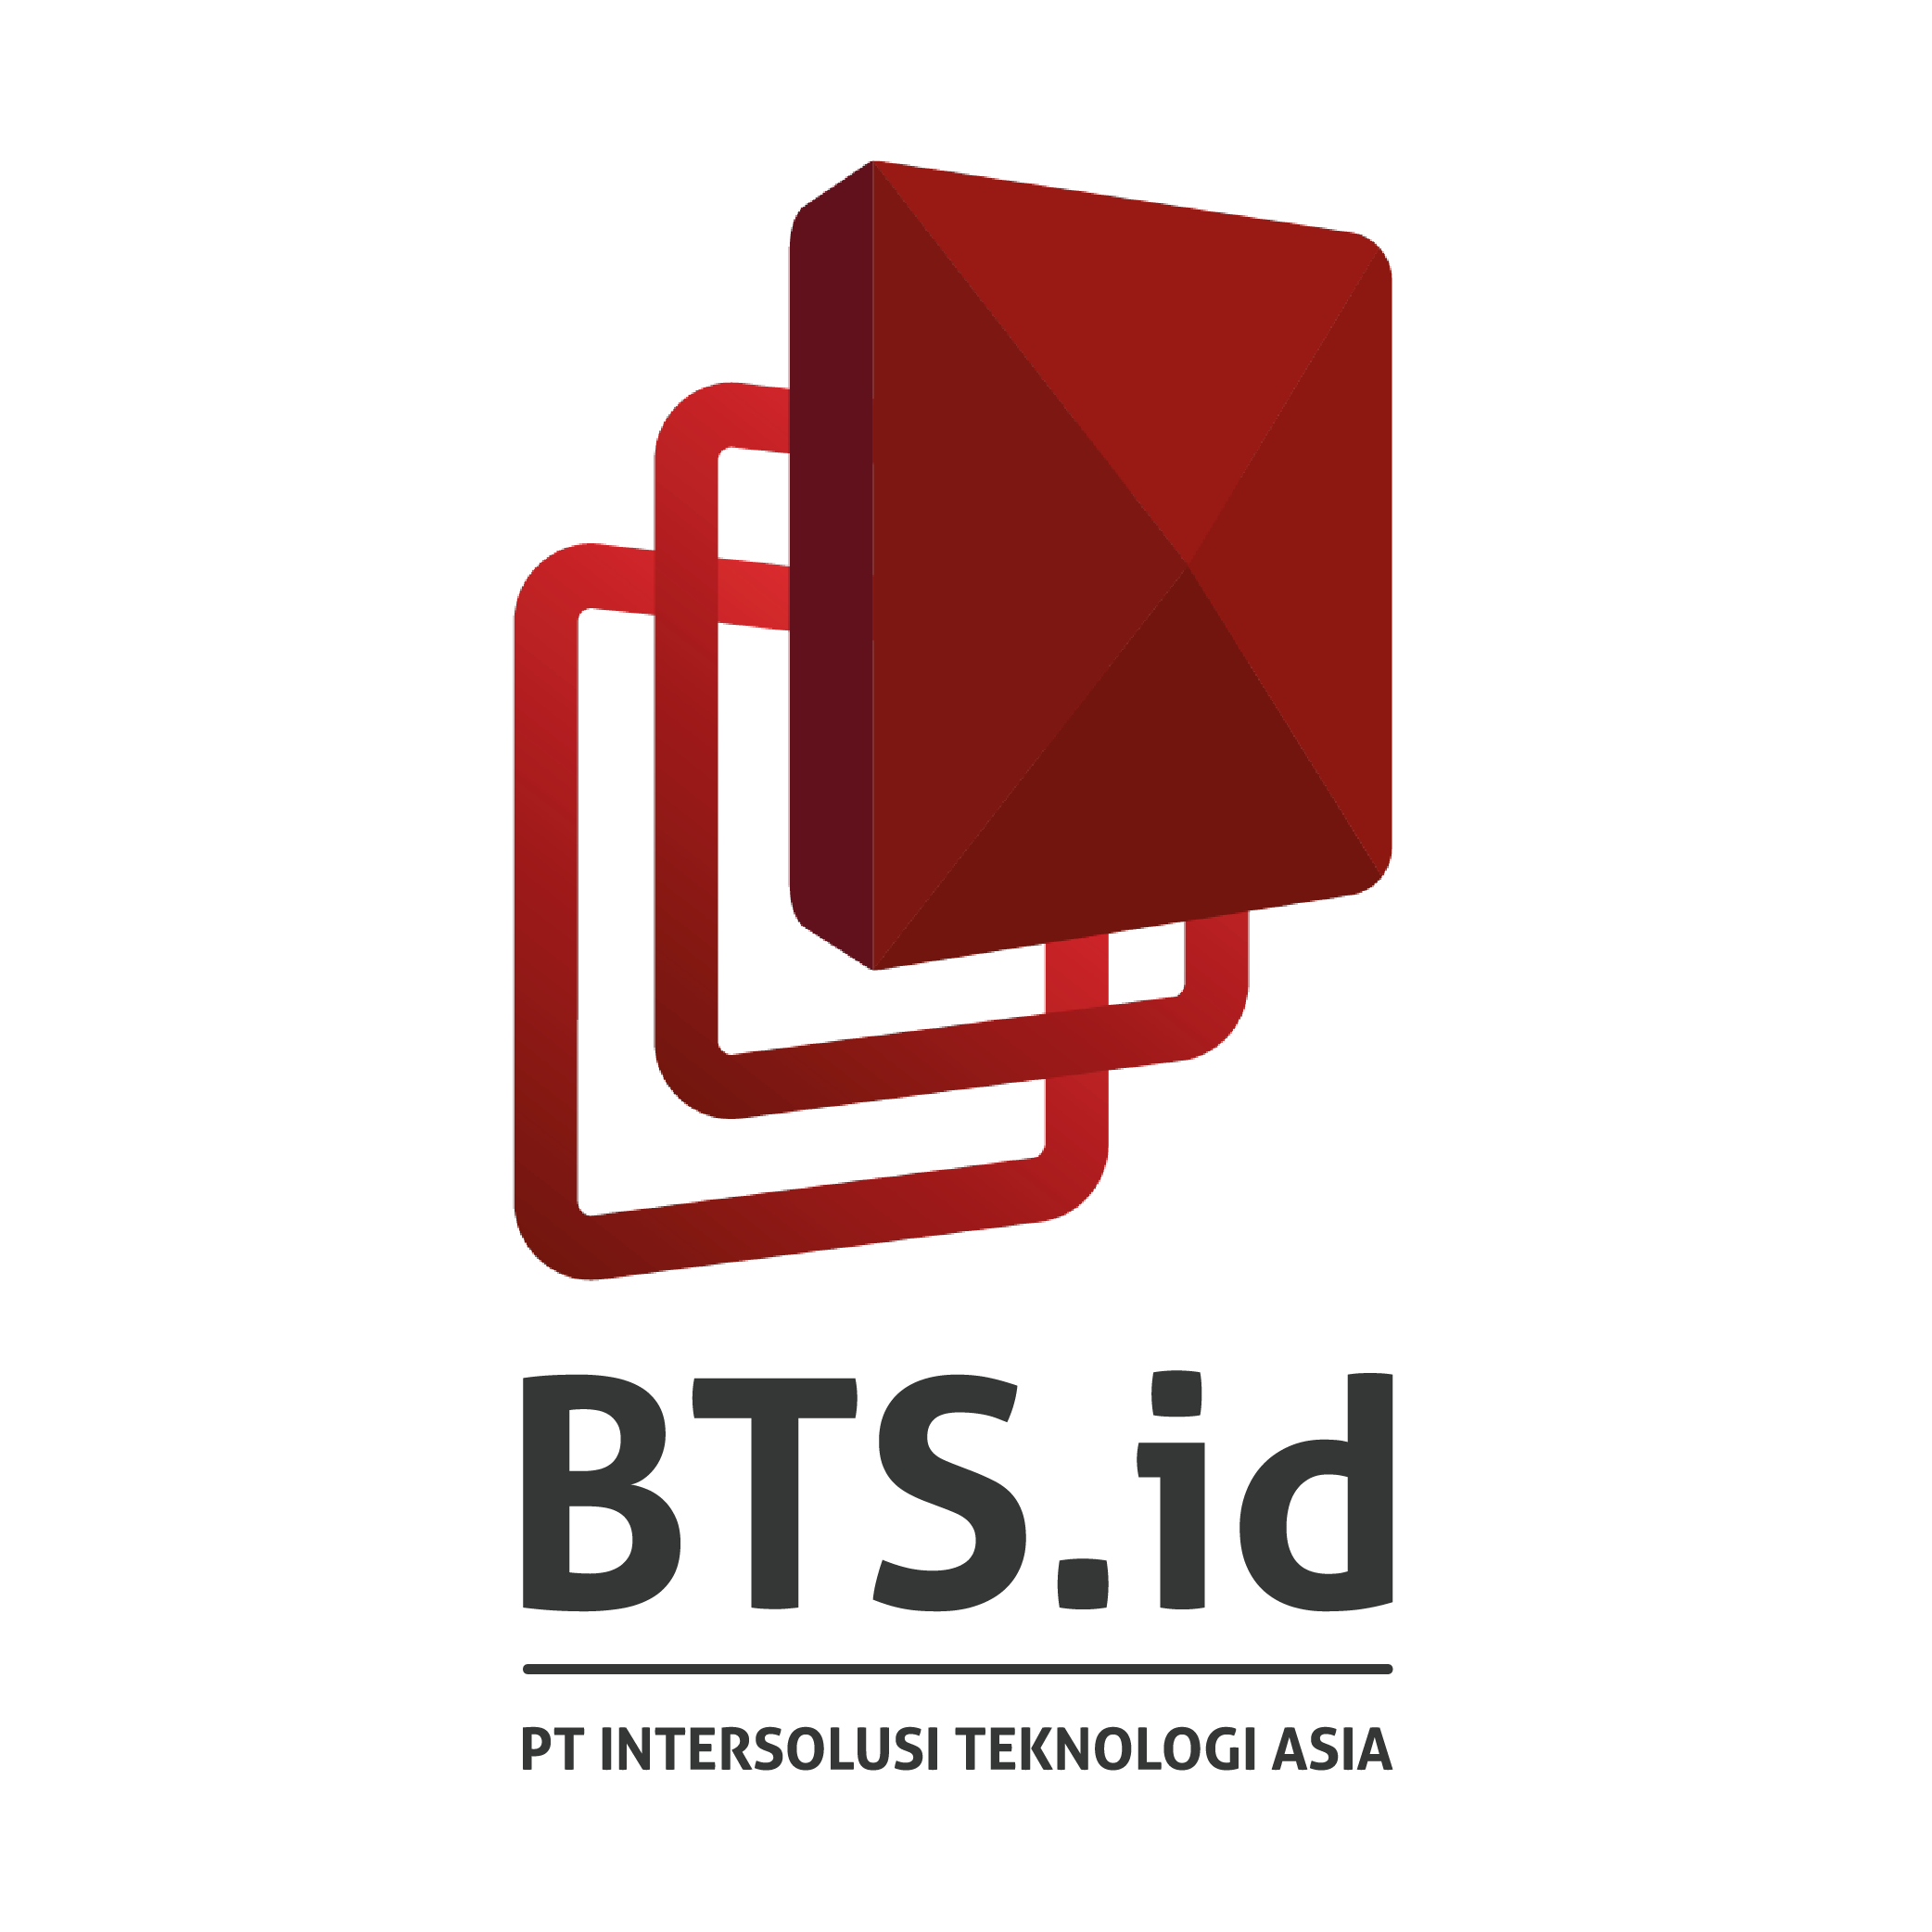 Intersolusi Teknologi Asia Pt